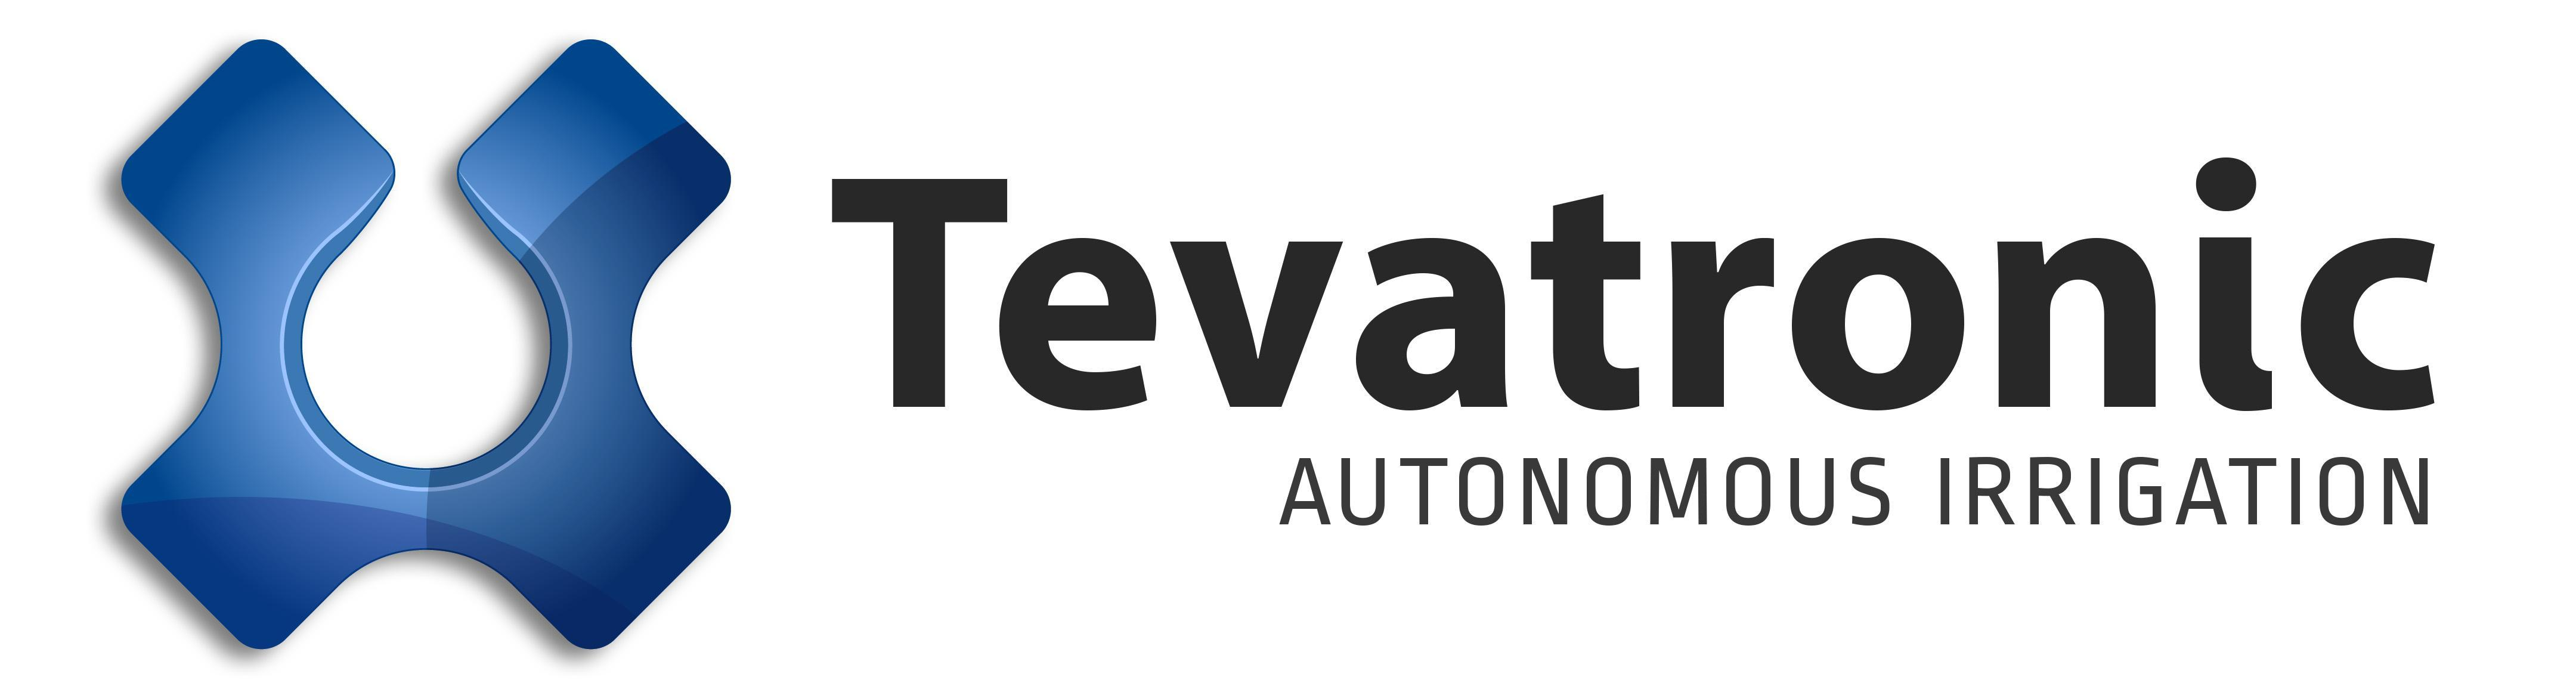 Tevatronic company logo